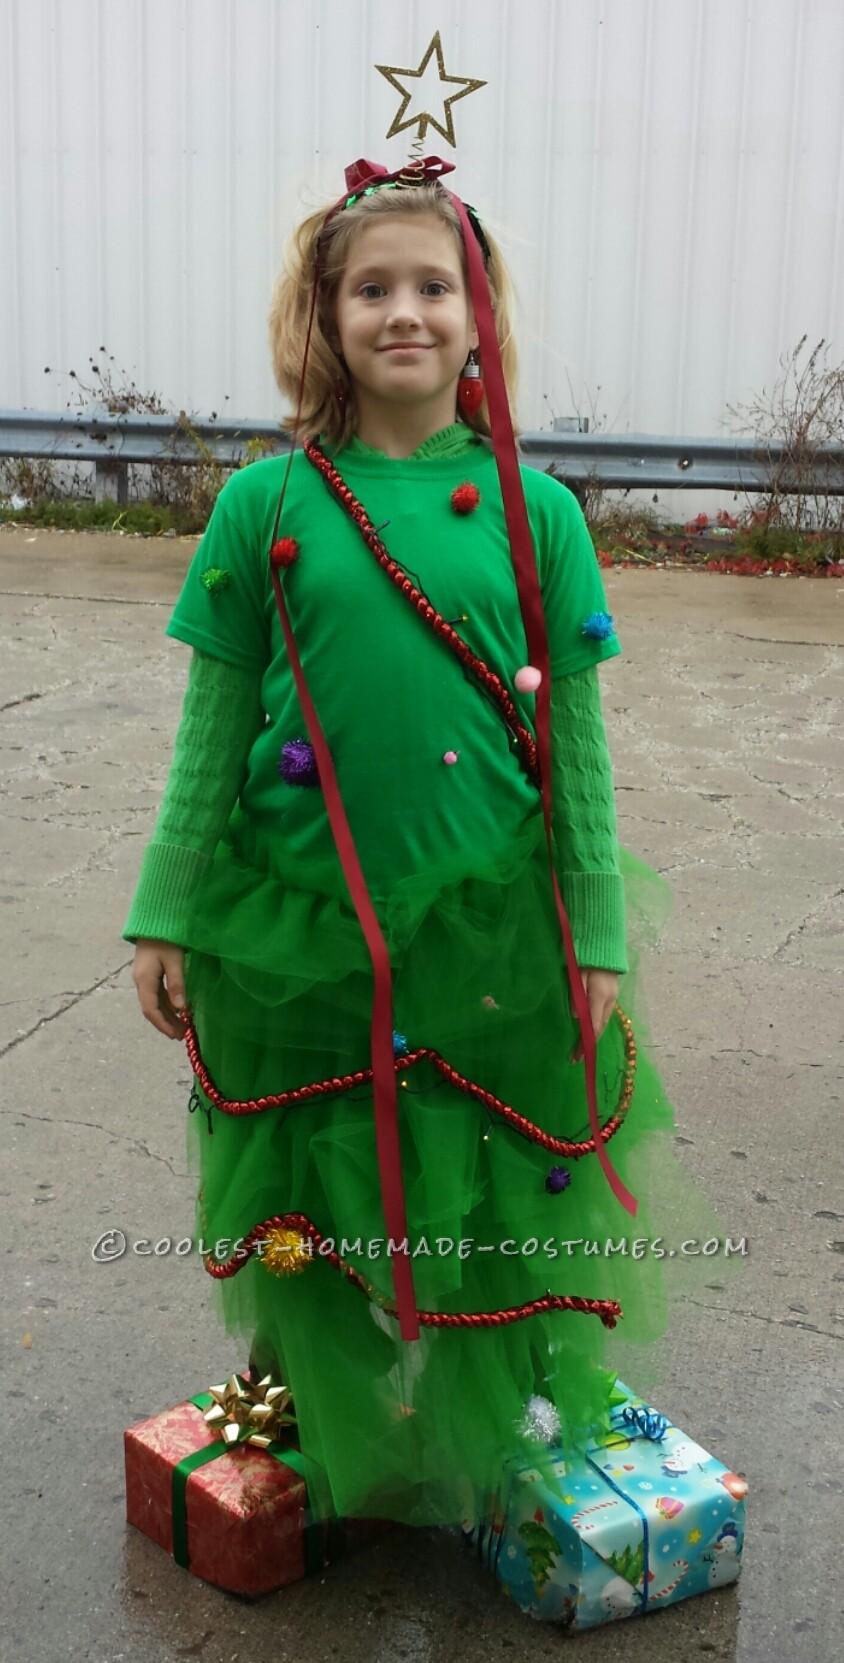 Cool Homemade Christmas Tree Halloween Costume